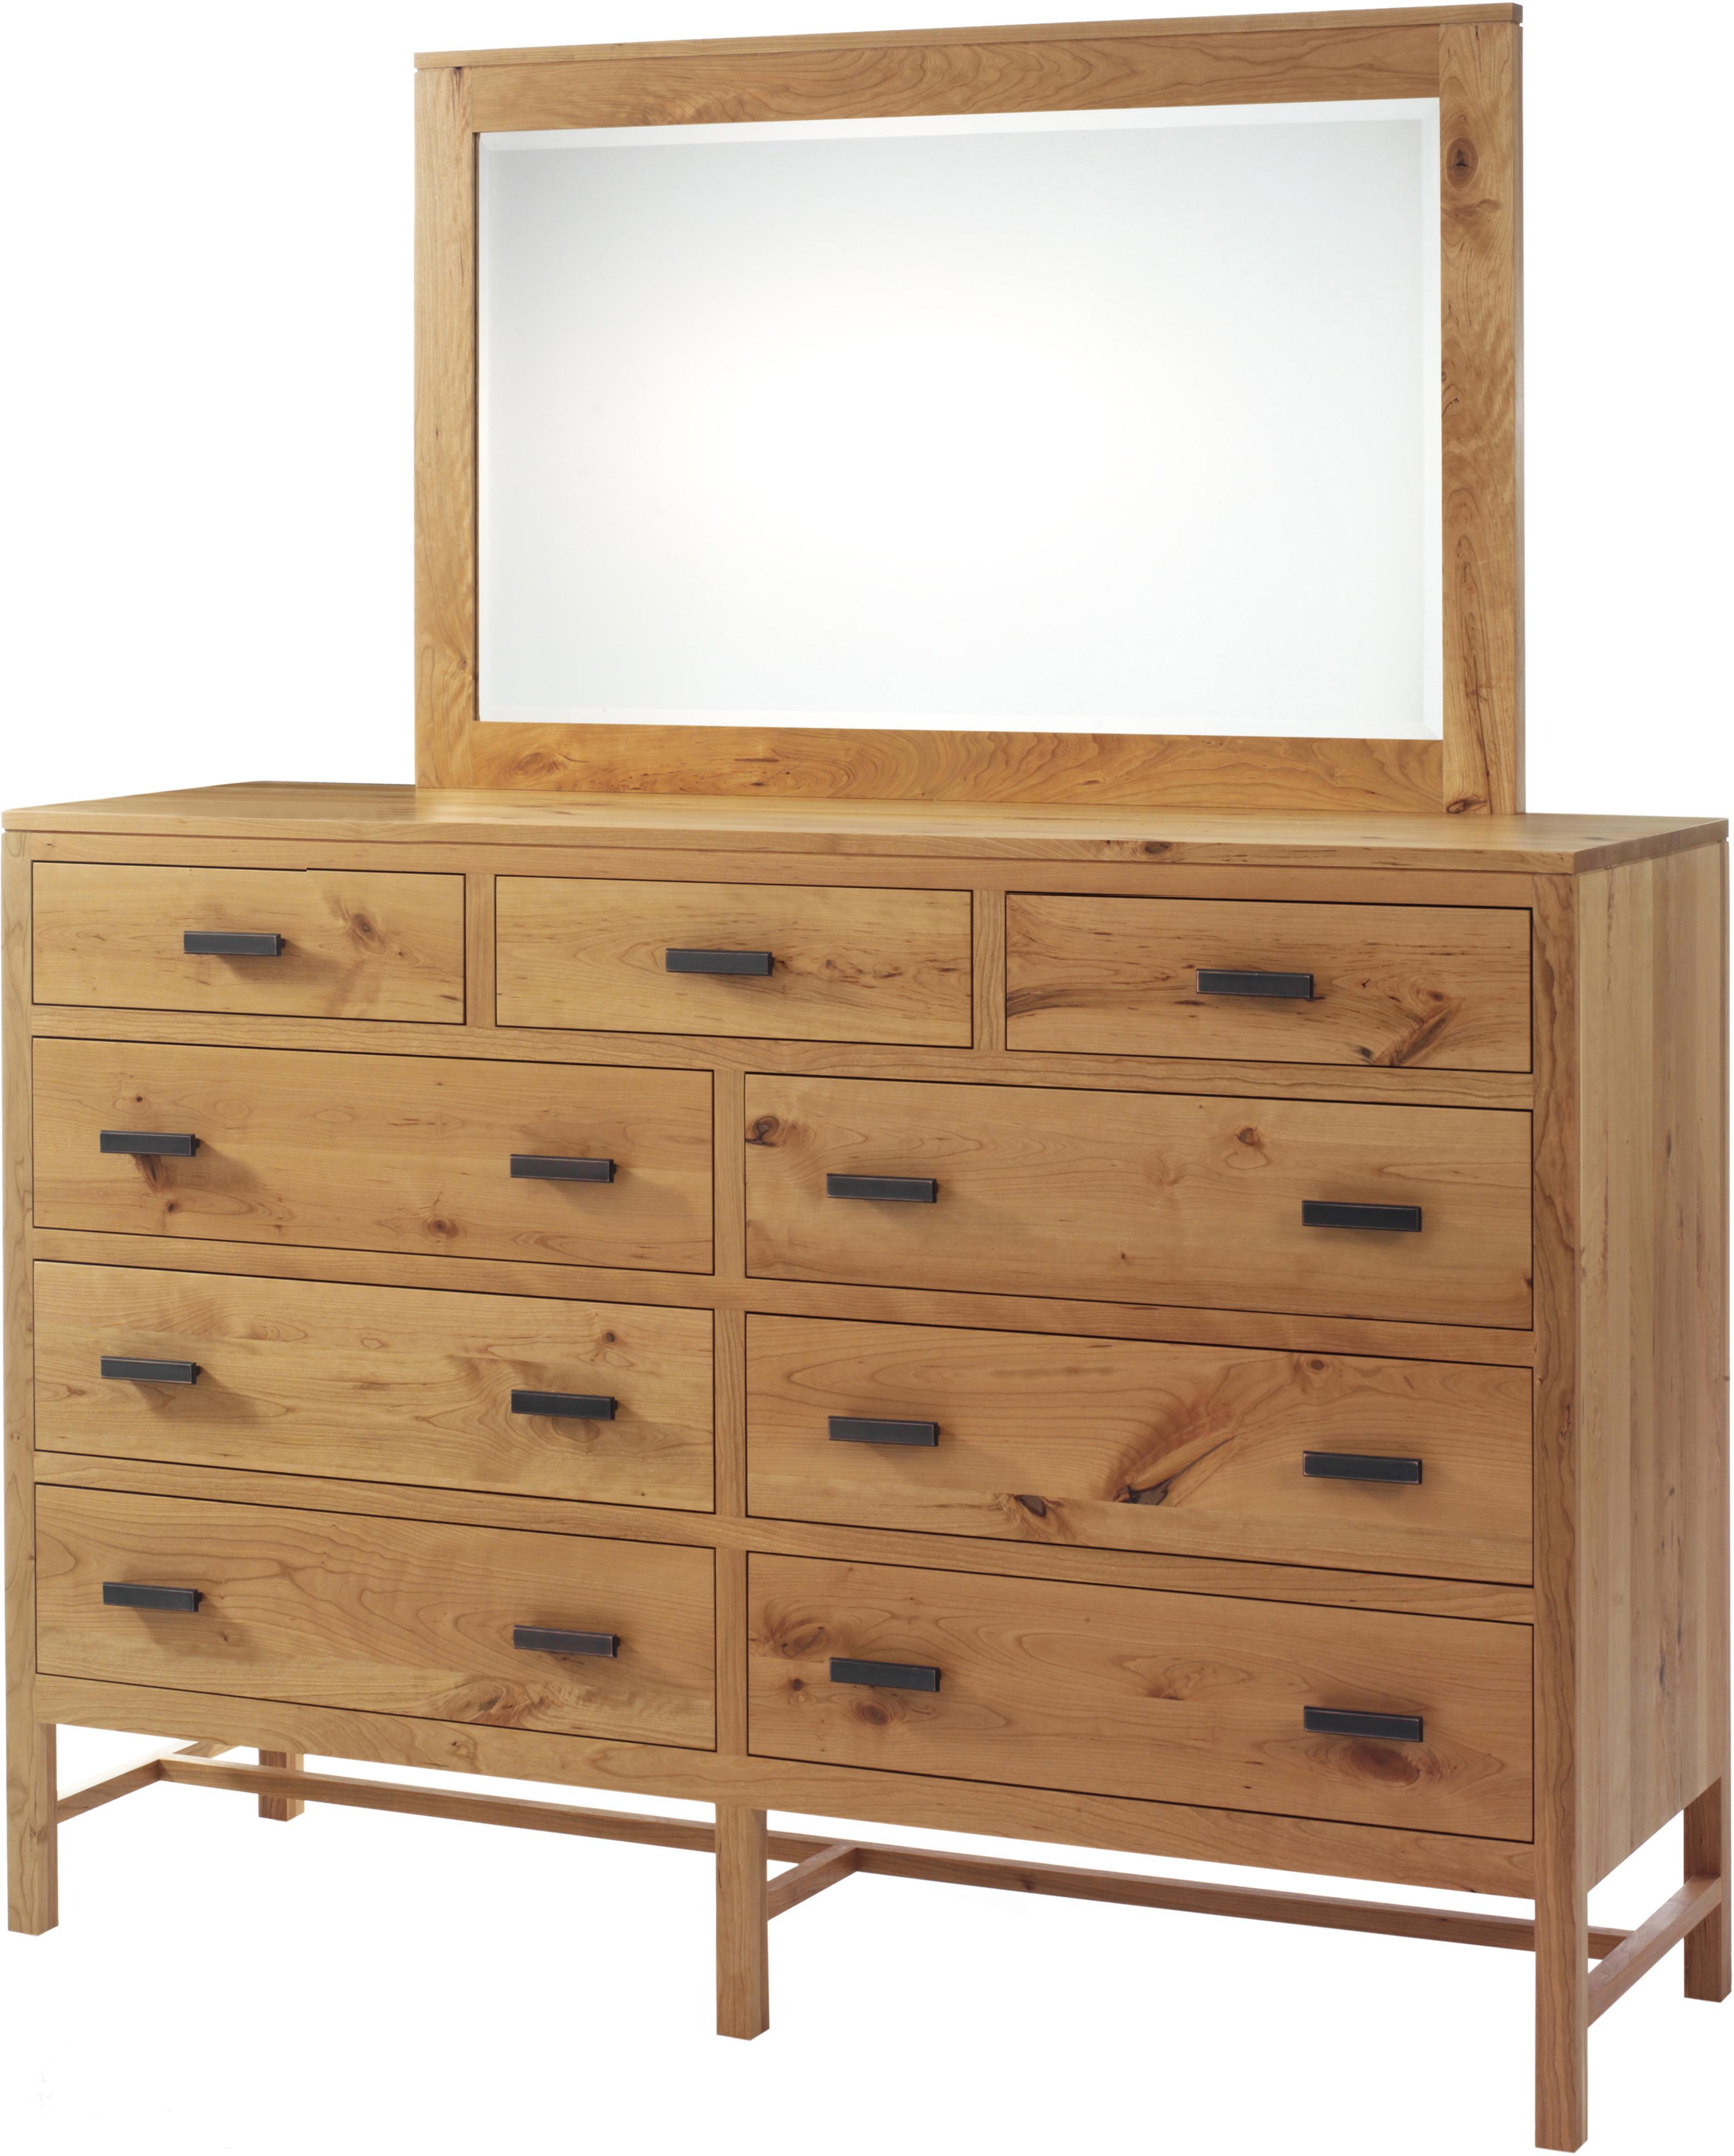 Lynnwood Dresser and Mirror Set at Williams & Kay